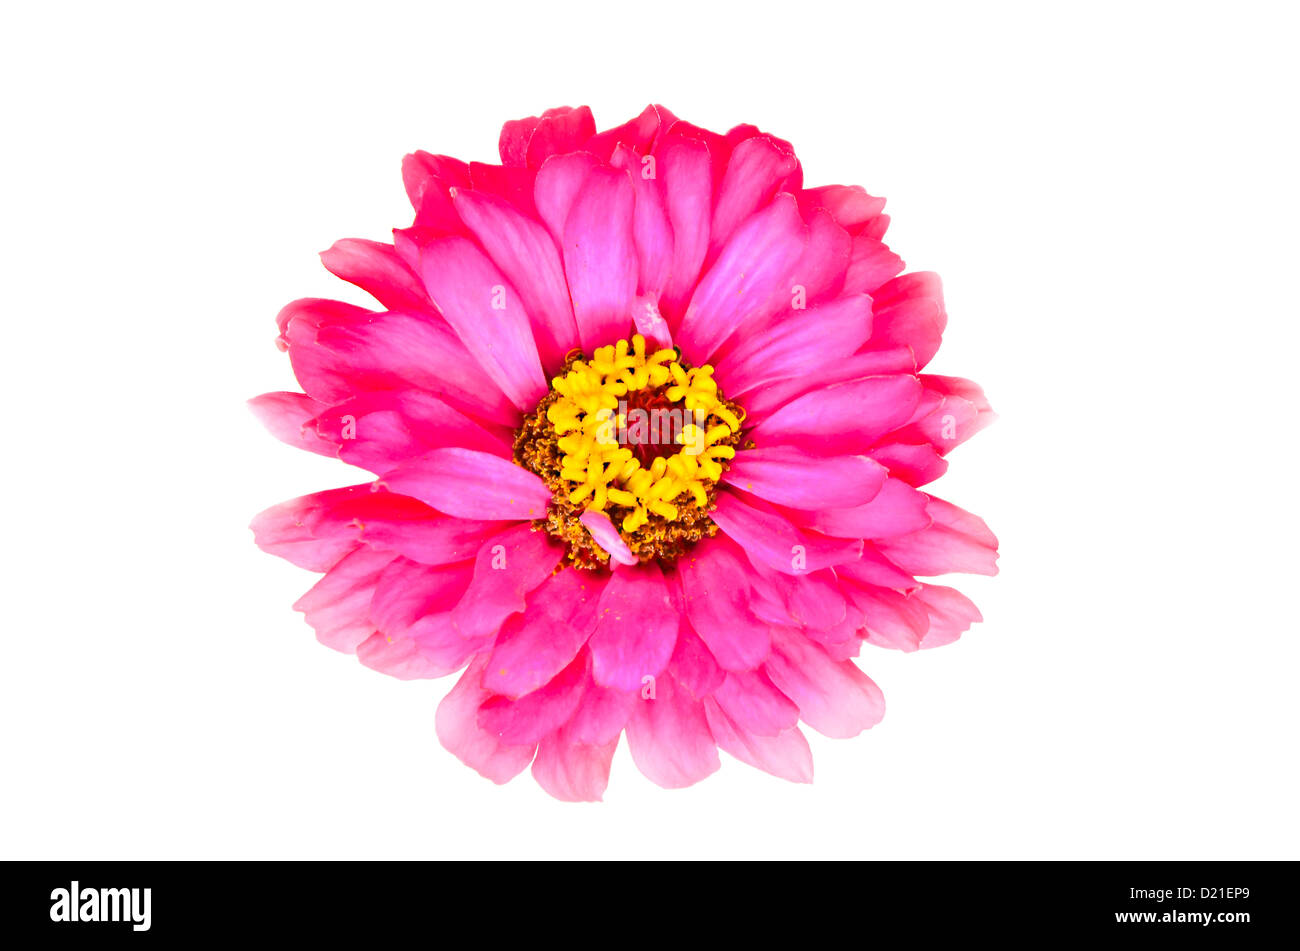 magenta zinnia flower on green background - Stock Image